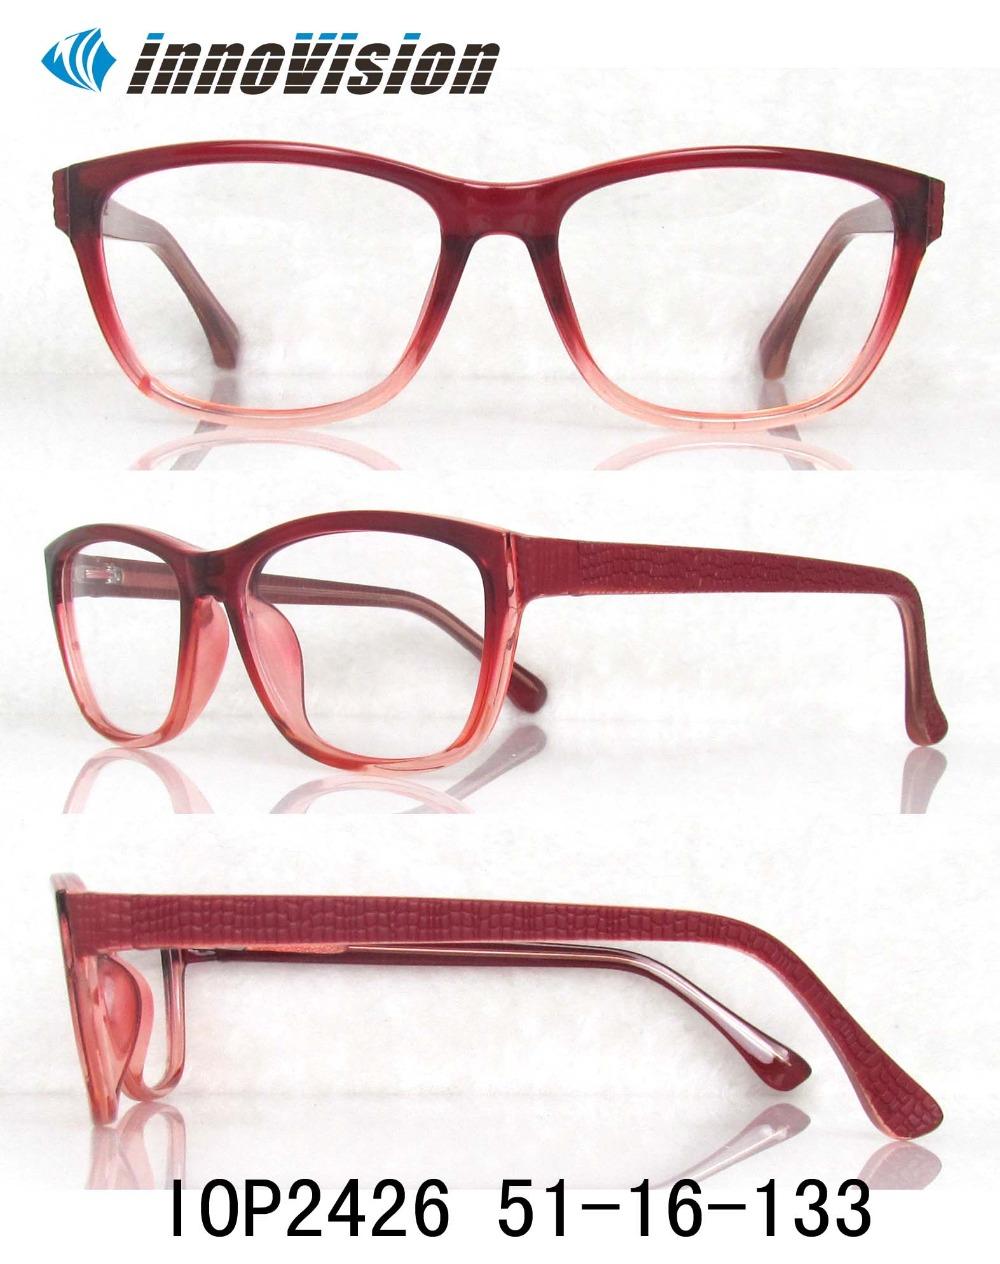 Marketing Injection Kunststoff Optische Rahmen Brillengestell ...